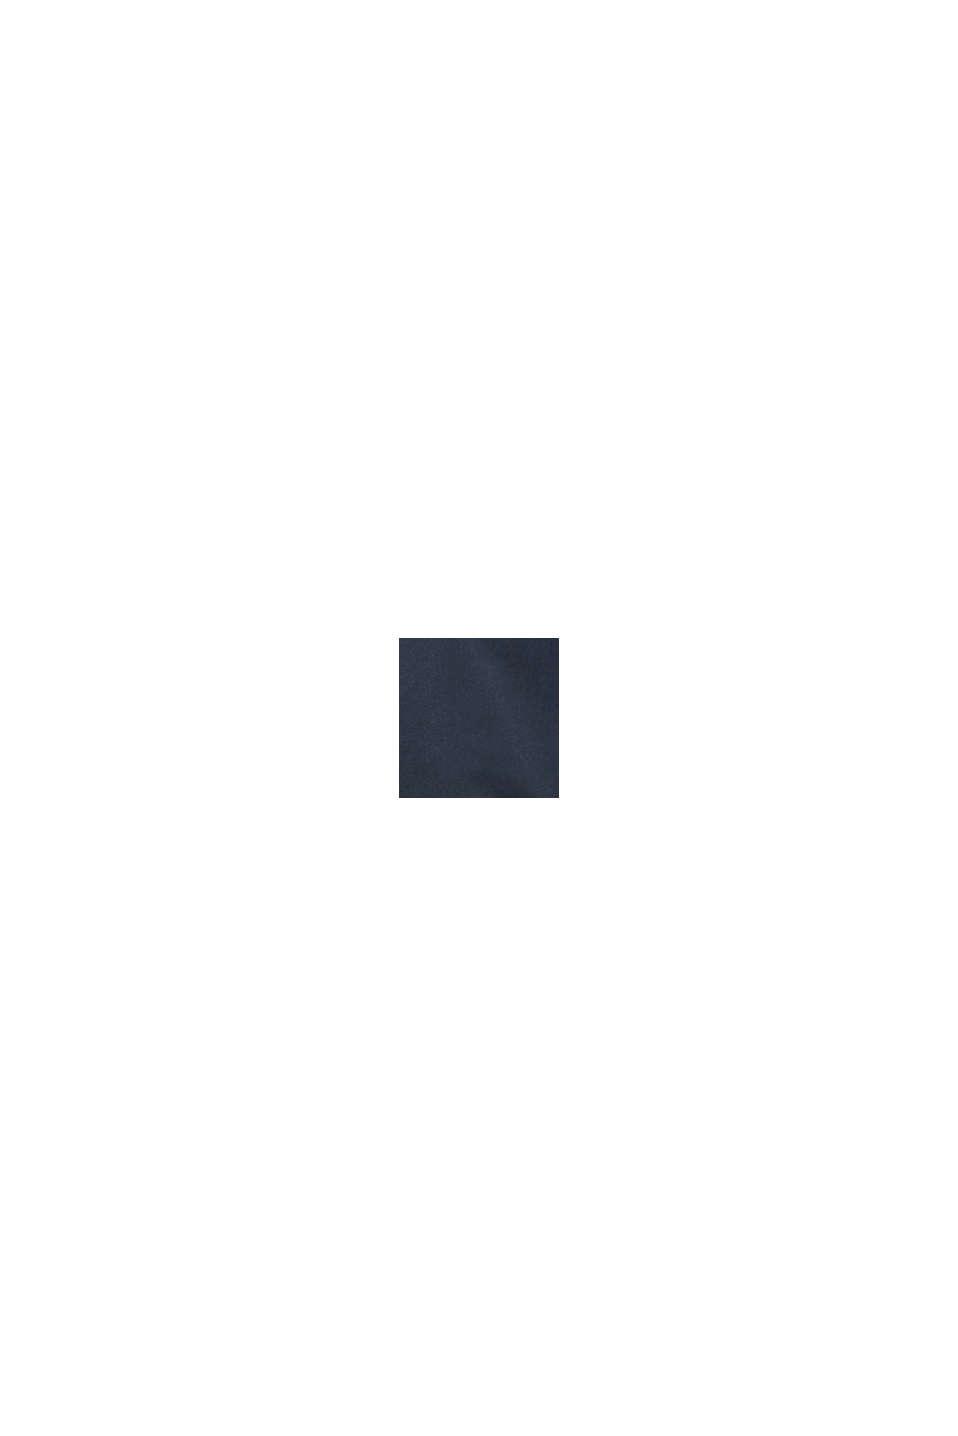 Giacca leggera outdoor in misto cotone, DARK BLUE, swatch